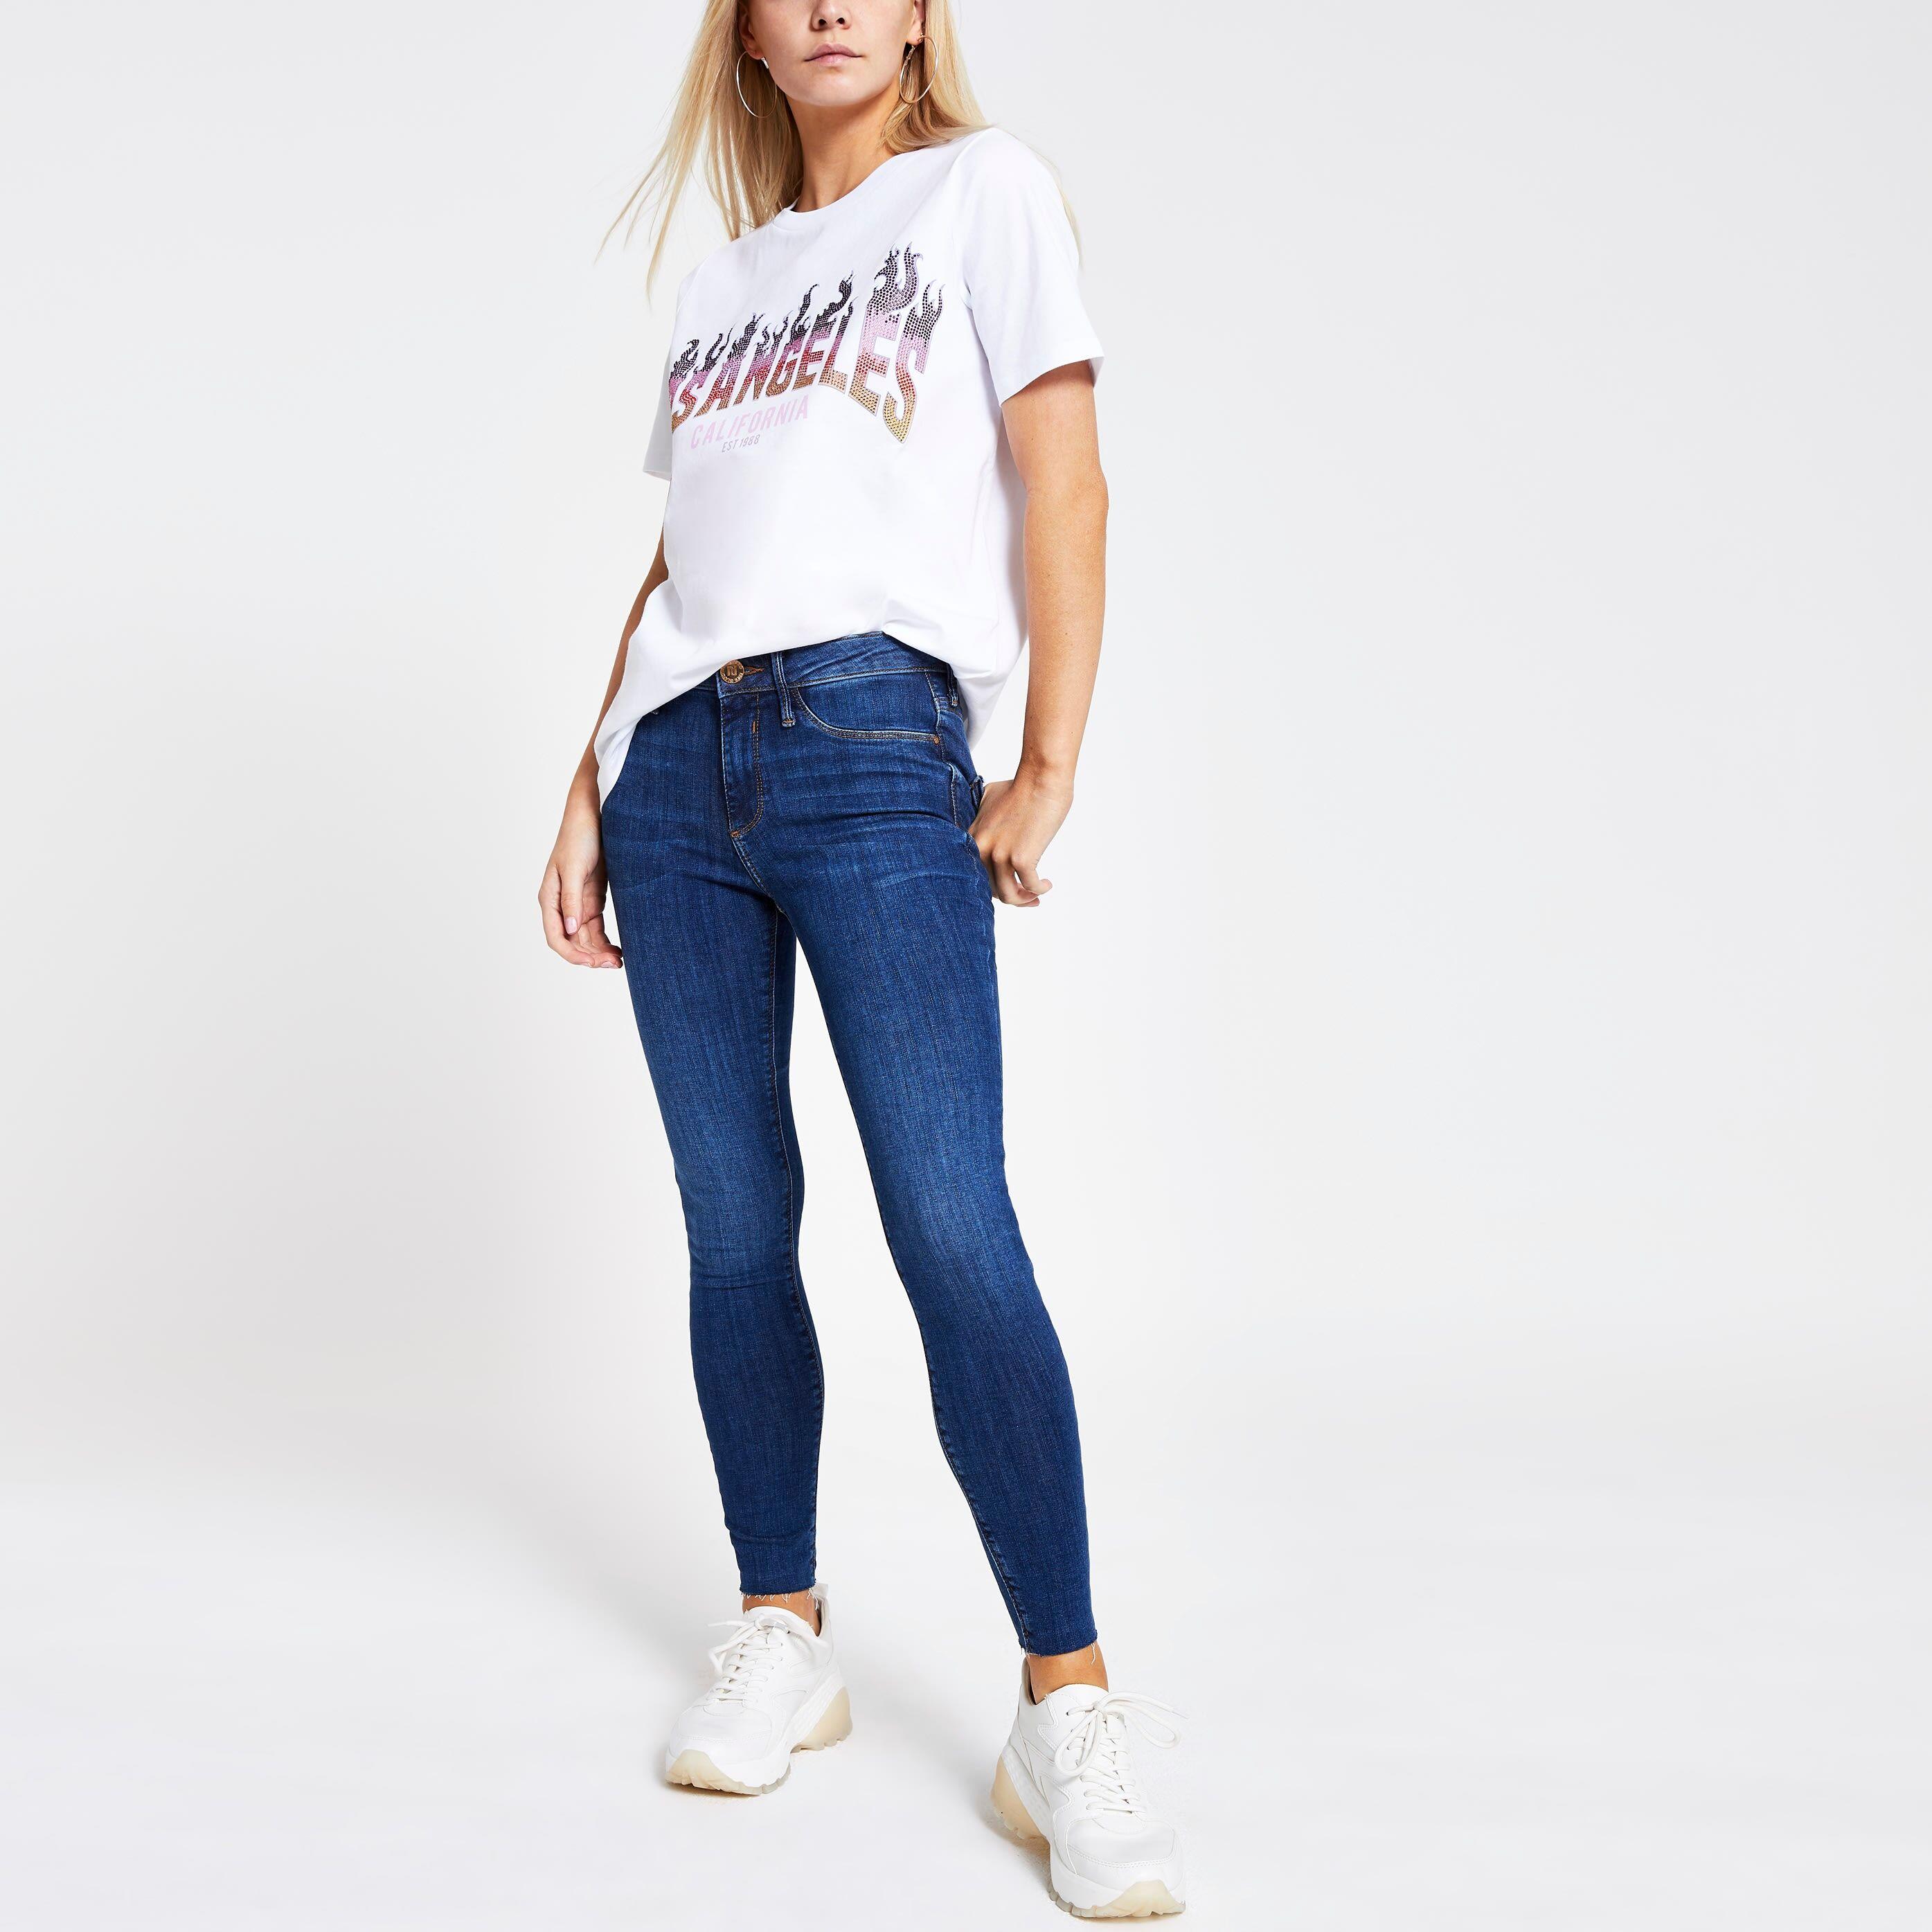 River Island Womens White 'Los Angeles' sequin print T-shirt (6)